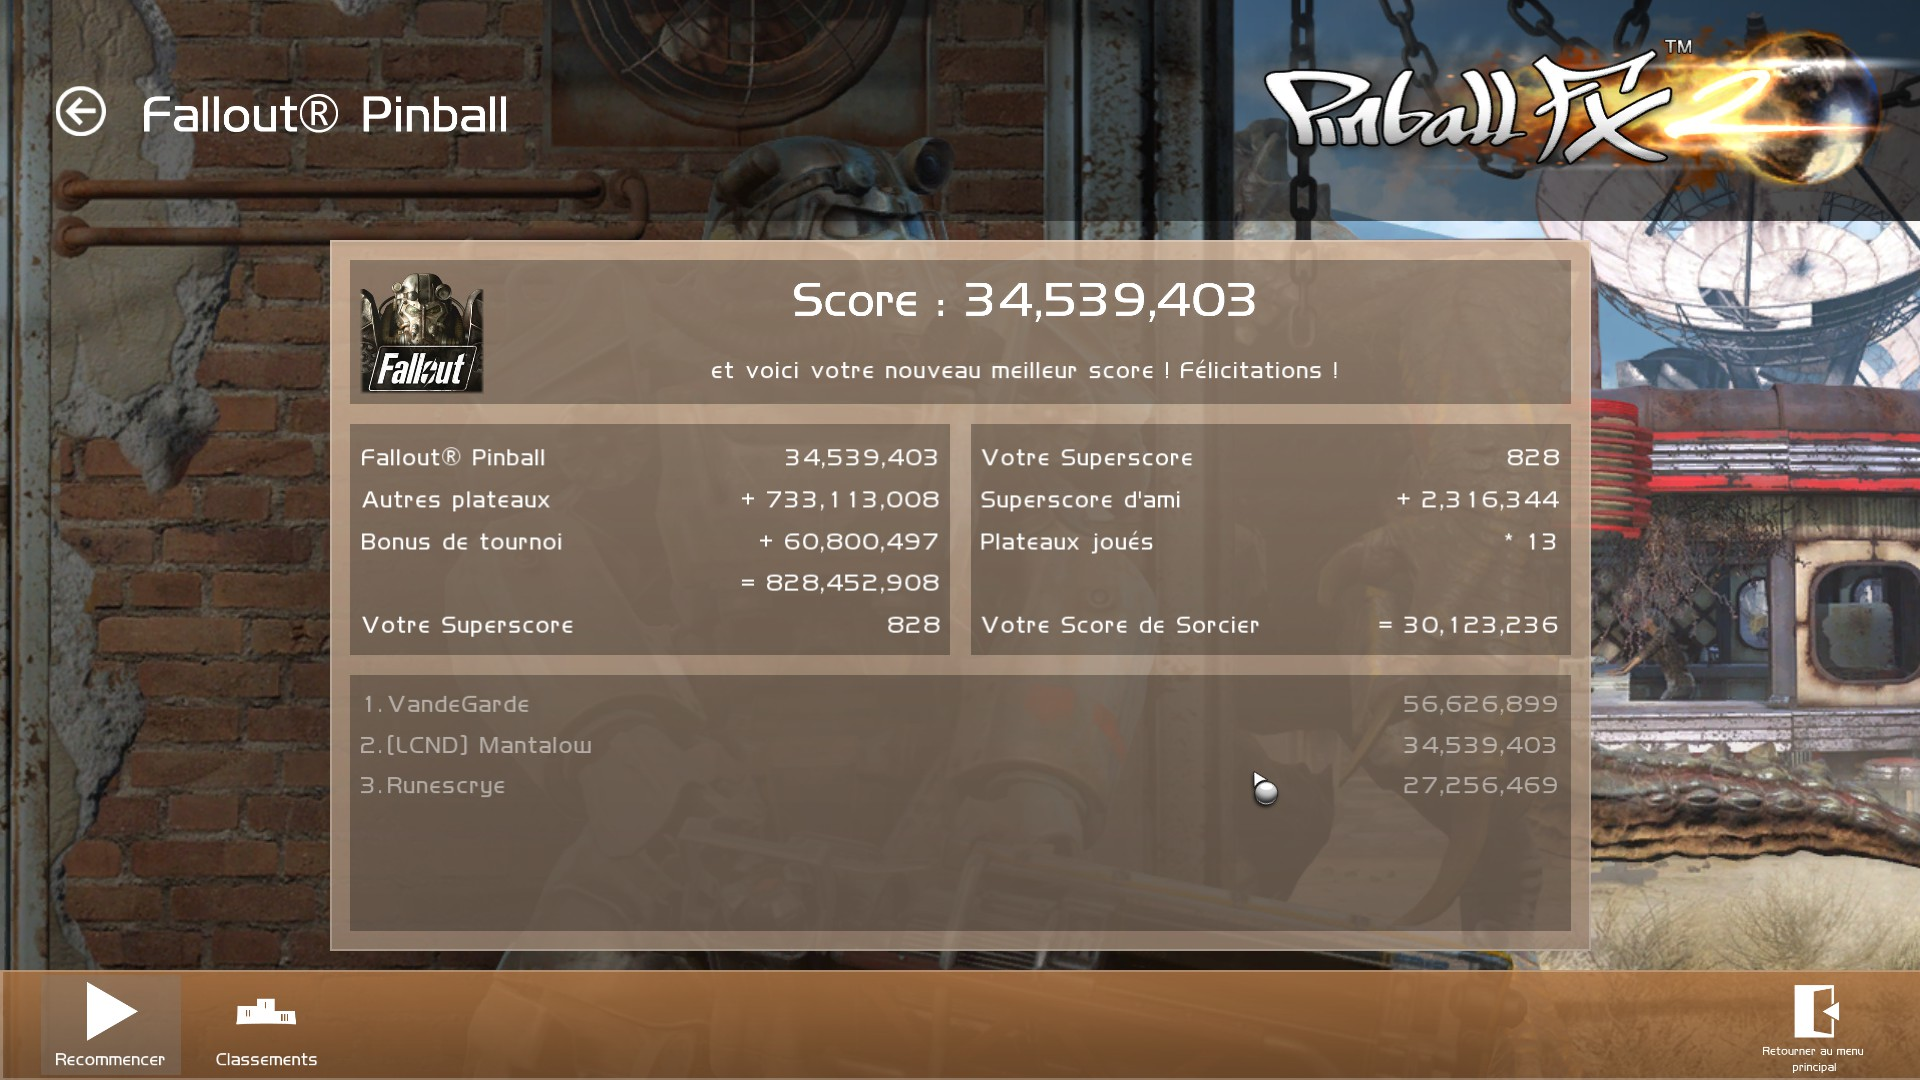 Mantalow: Pinball FX 2: Fallout Pinball (PC) 34,539,403 points on 2016-12-08 04:32:36